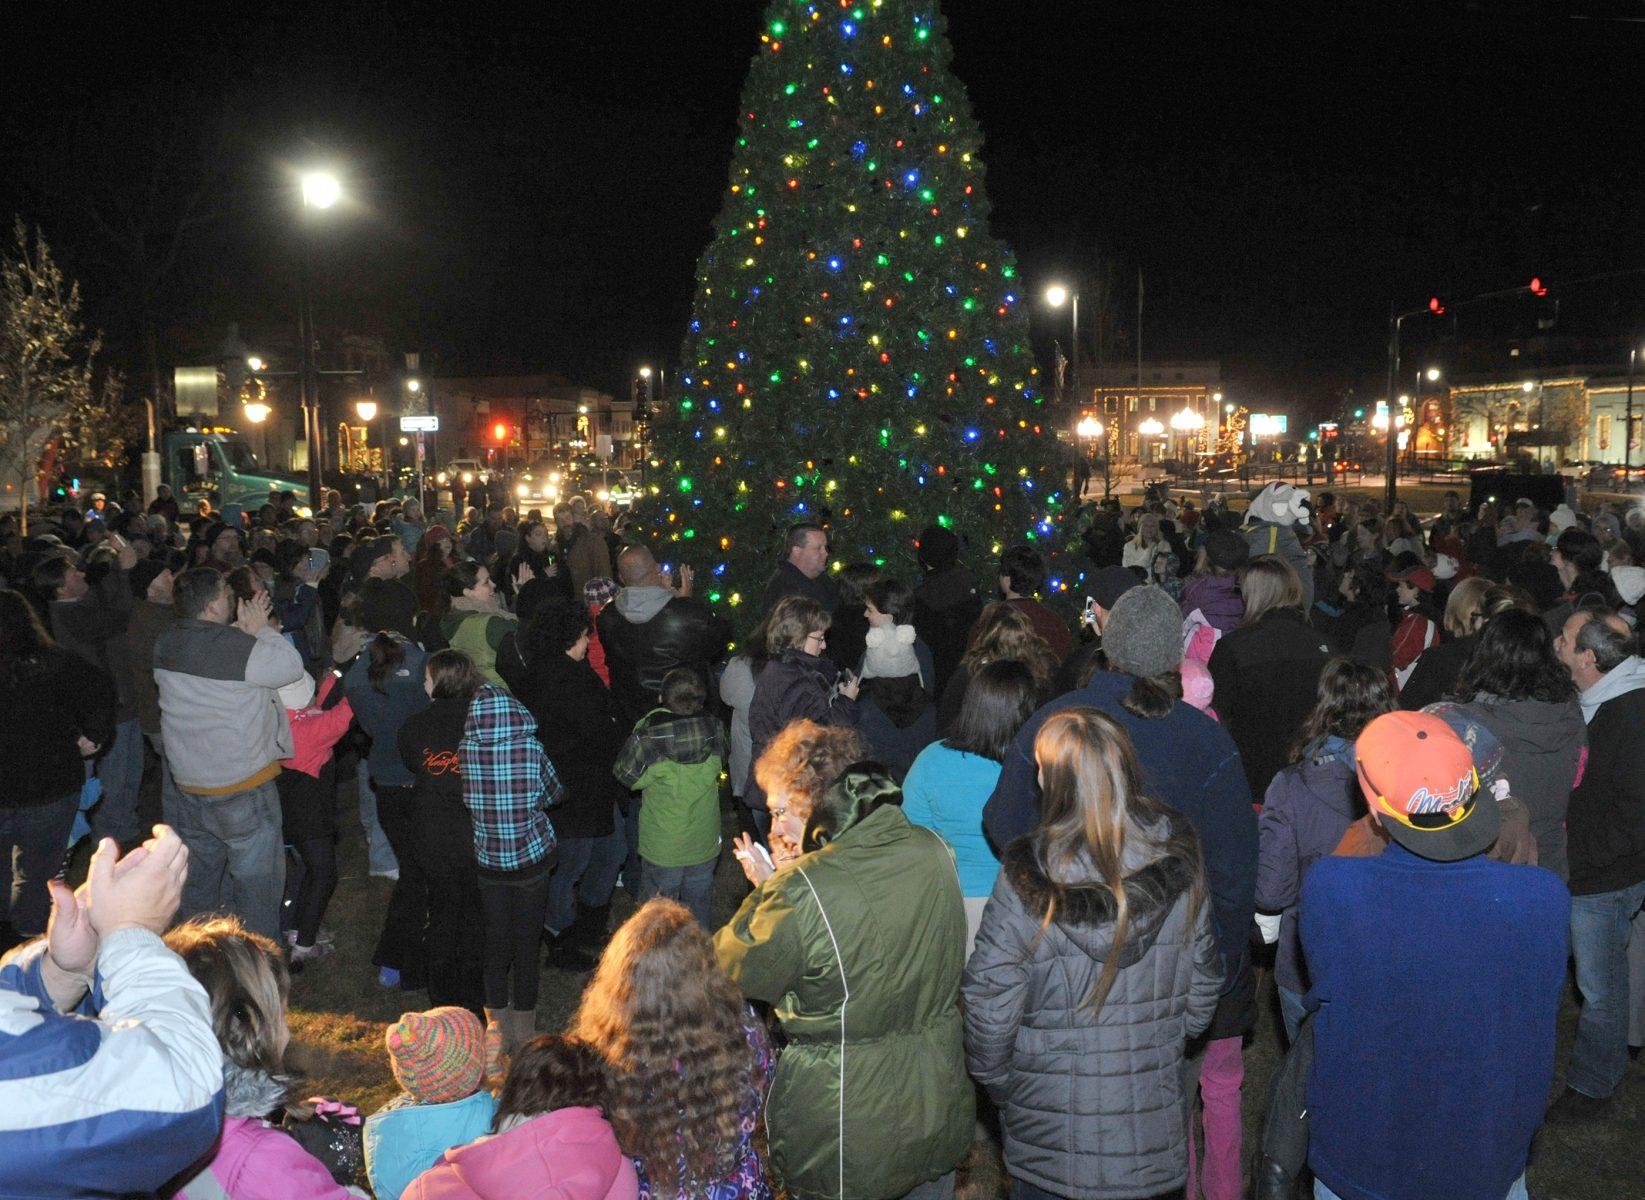 Mayor's tree lighting ceremony to occur this Saturday